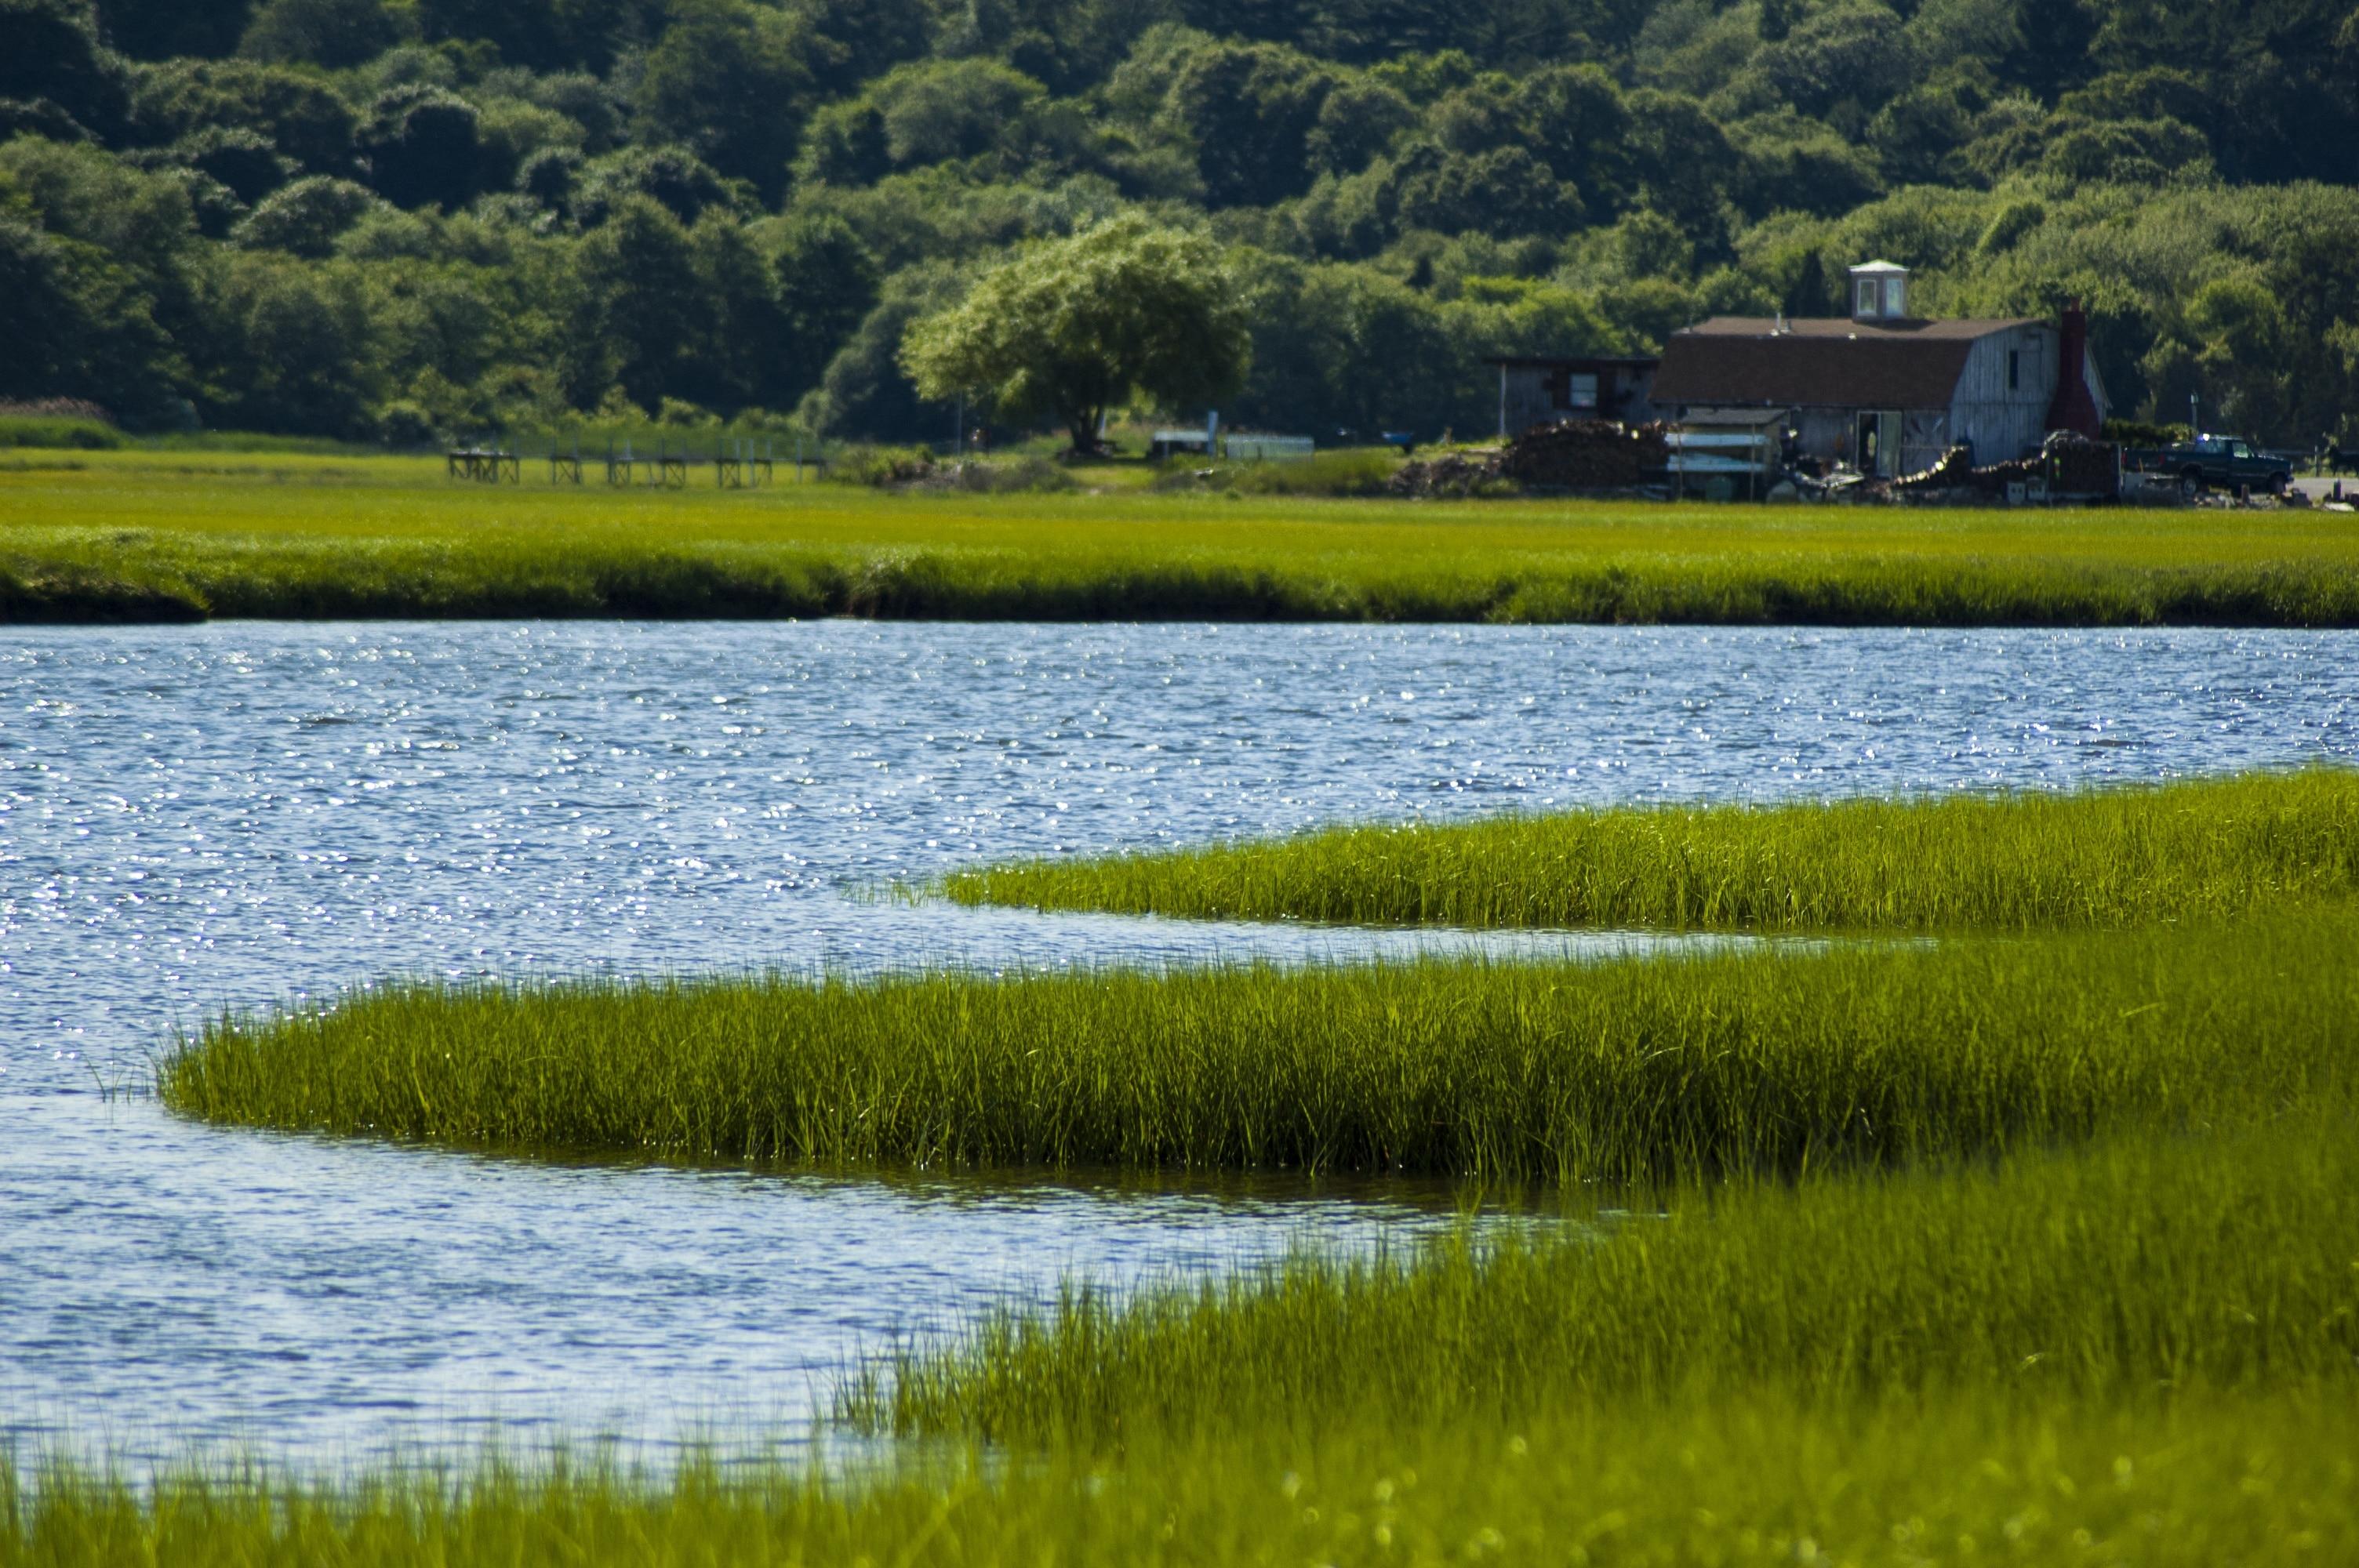 Marshfield, Massachusetts, United States of America